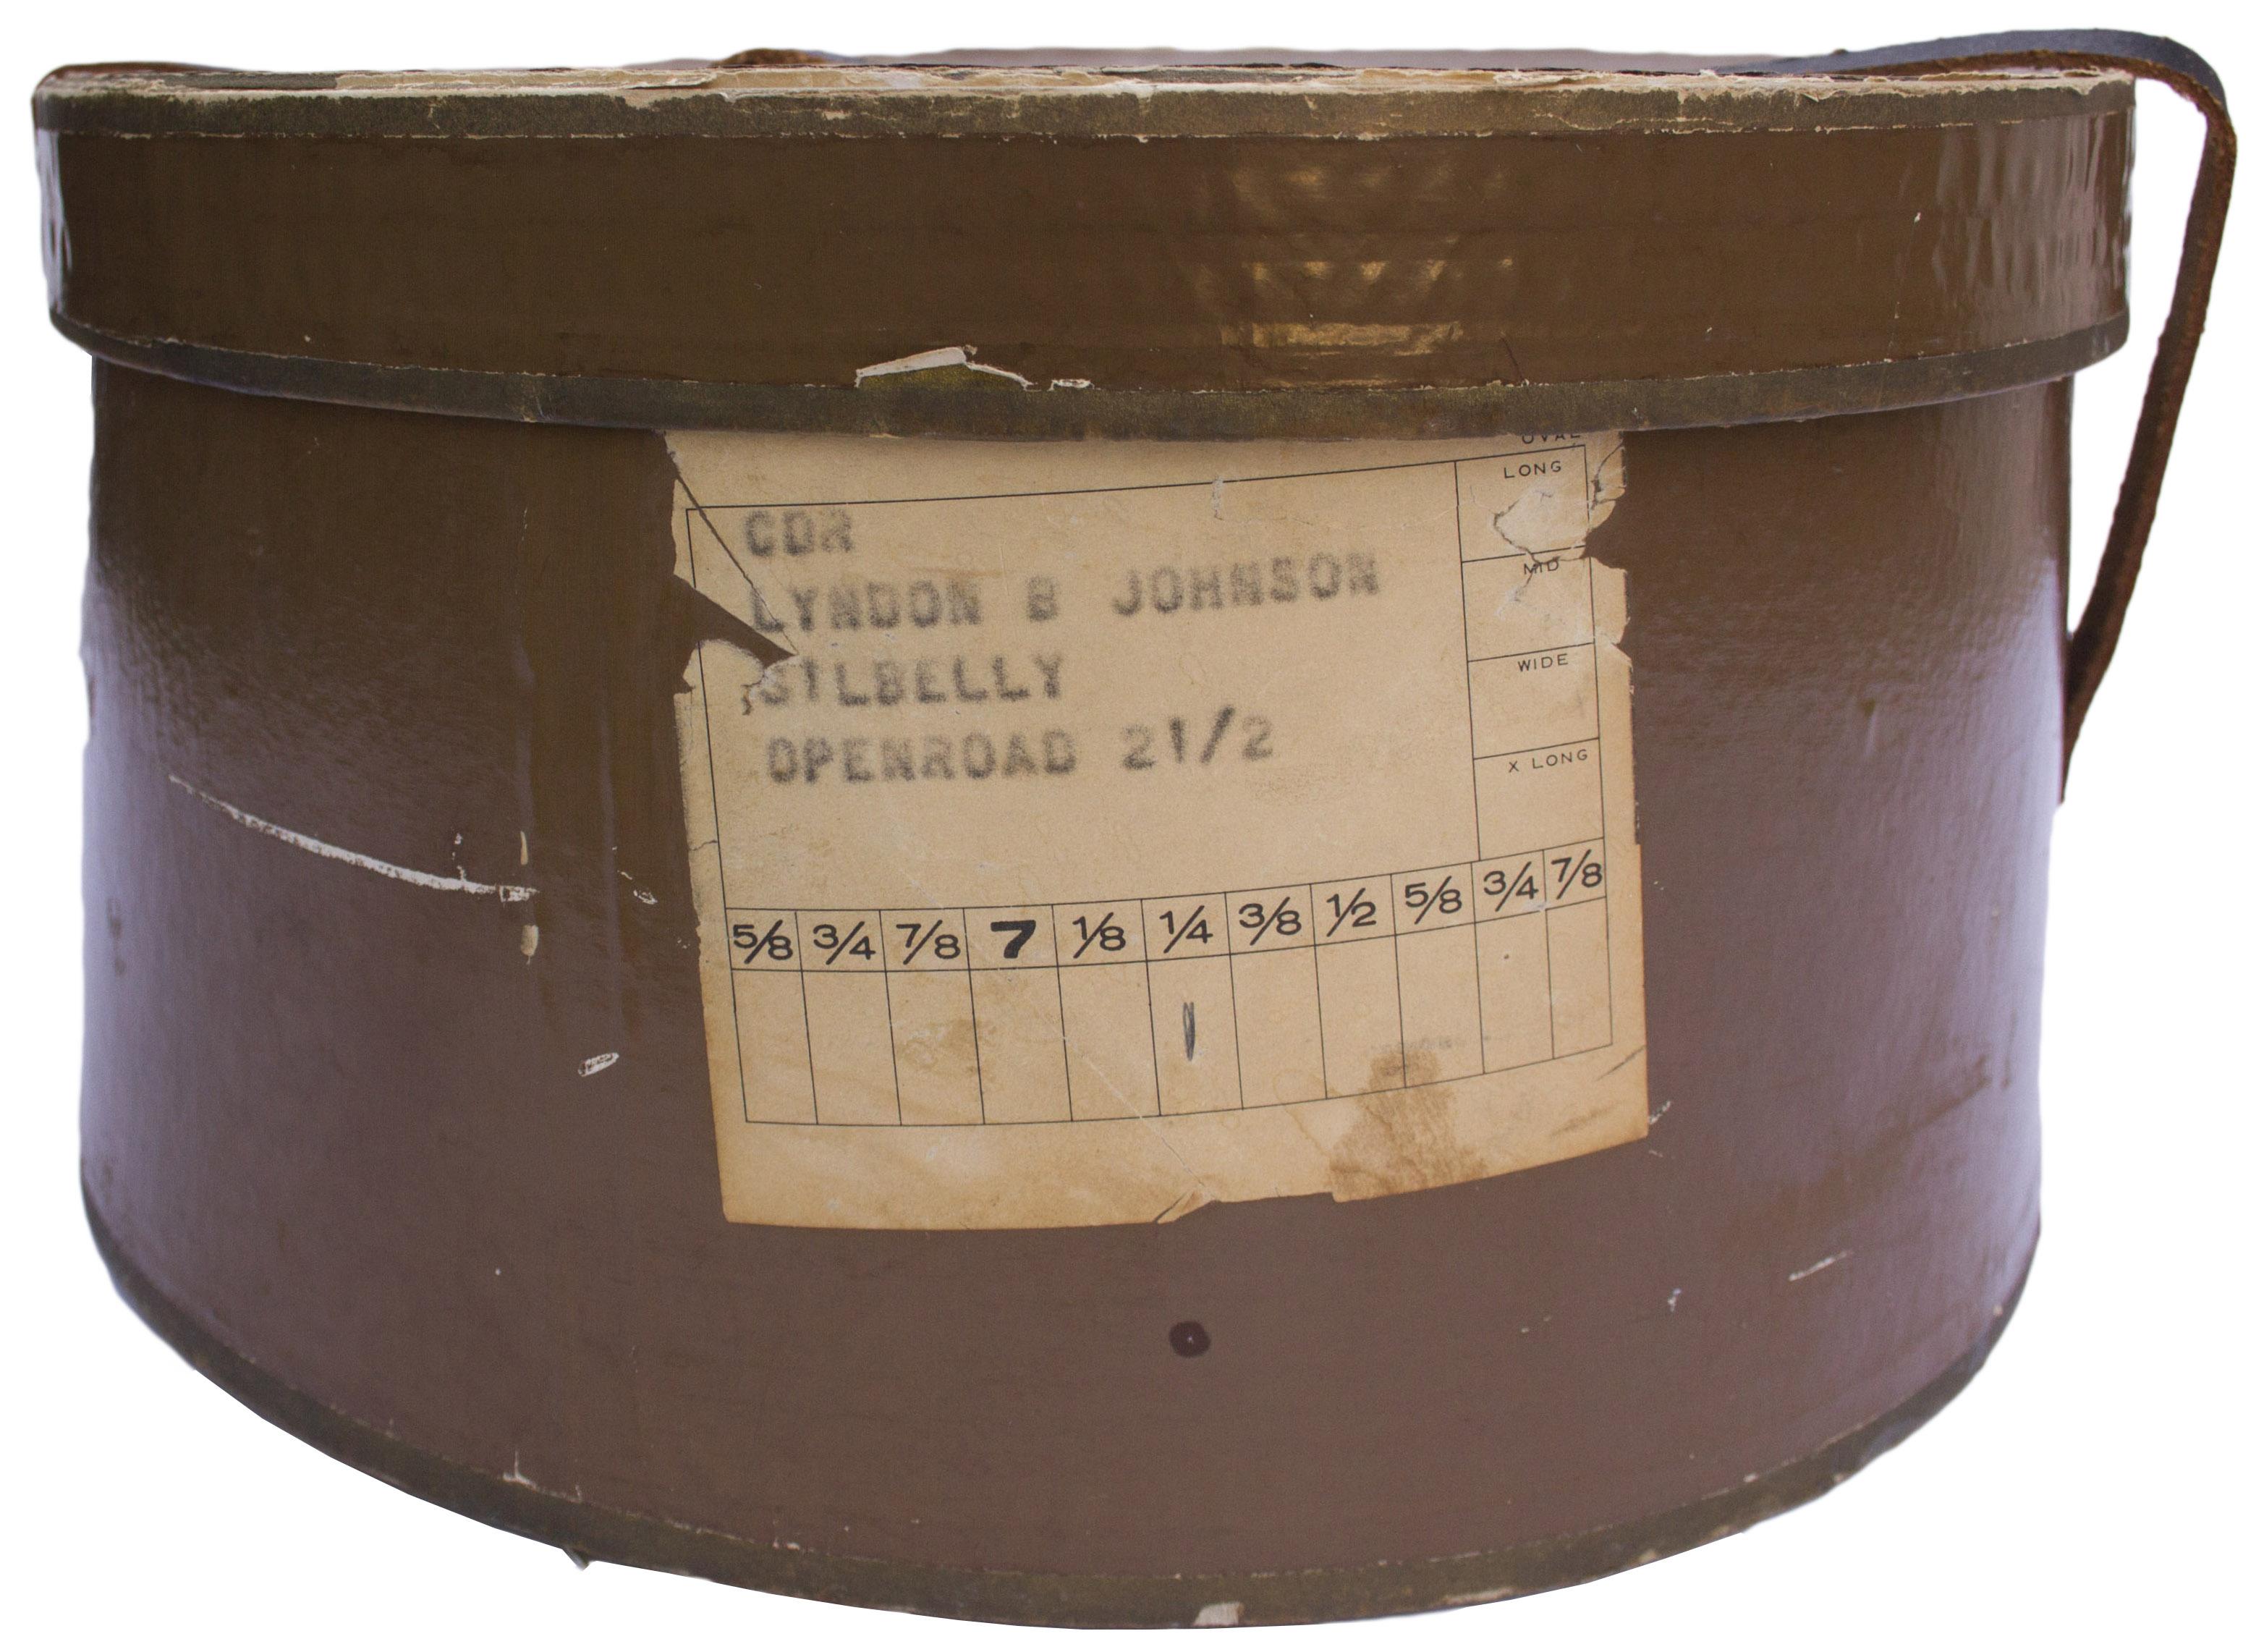 ... Lyndon B. Johnson s Personally Owned   Worn Stetson Hat --  Quintessential LBJ ... 193f6a4f128